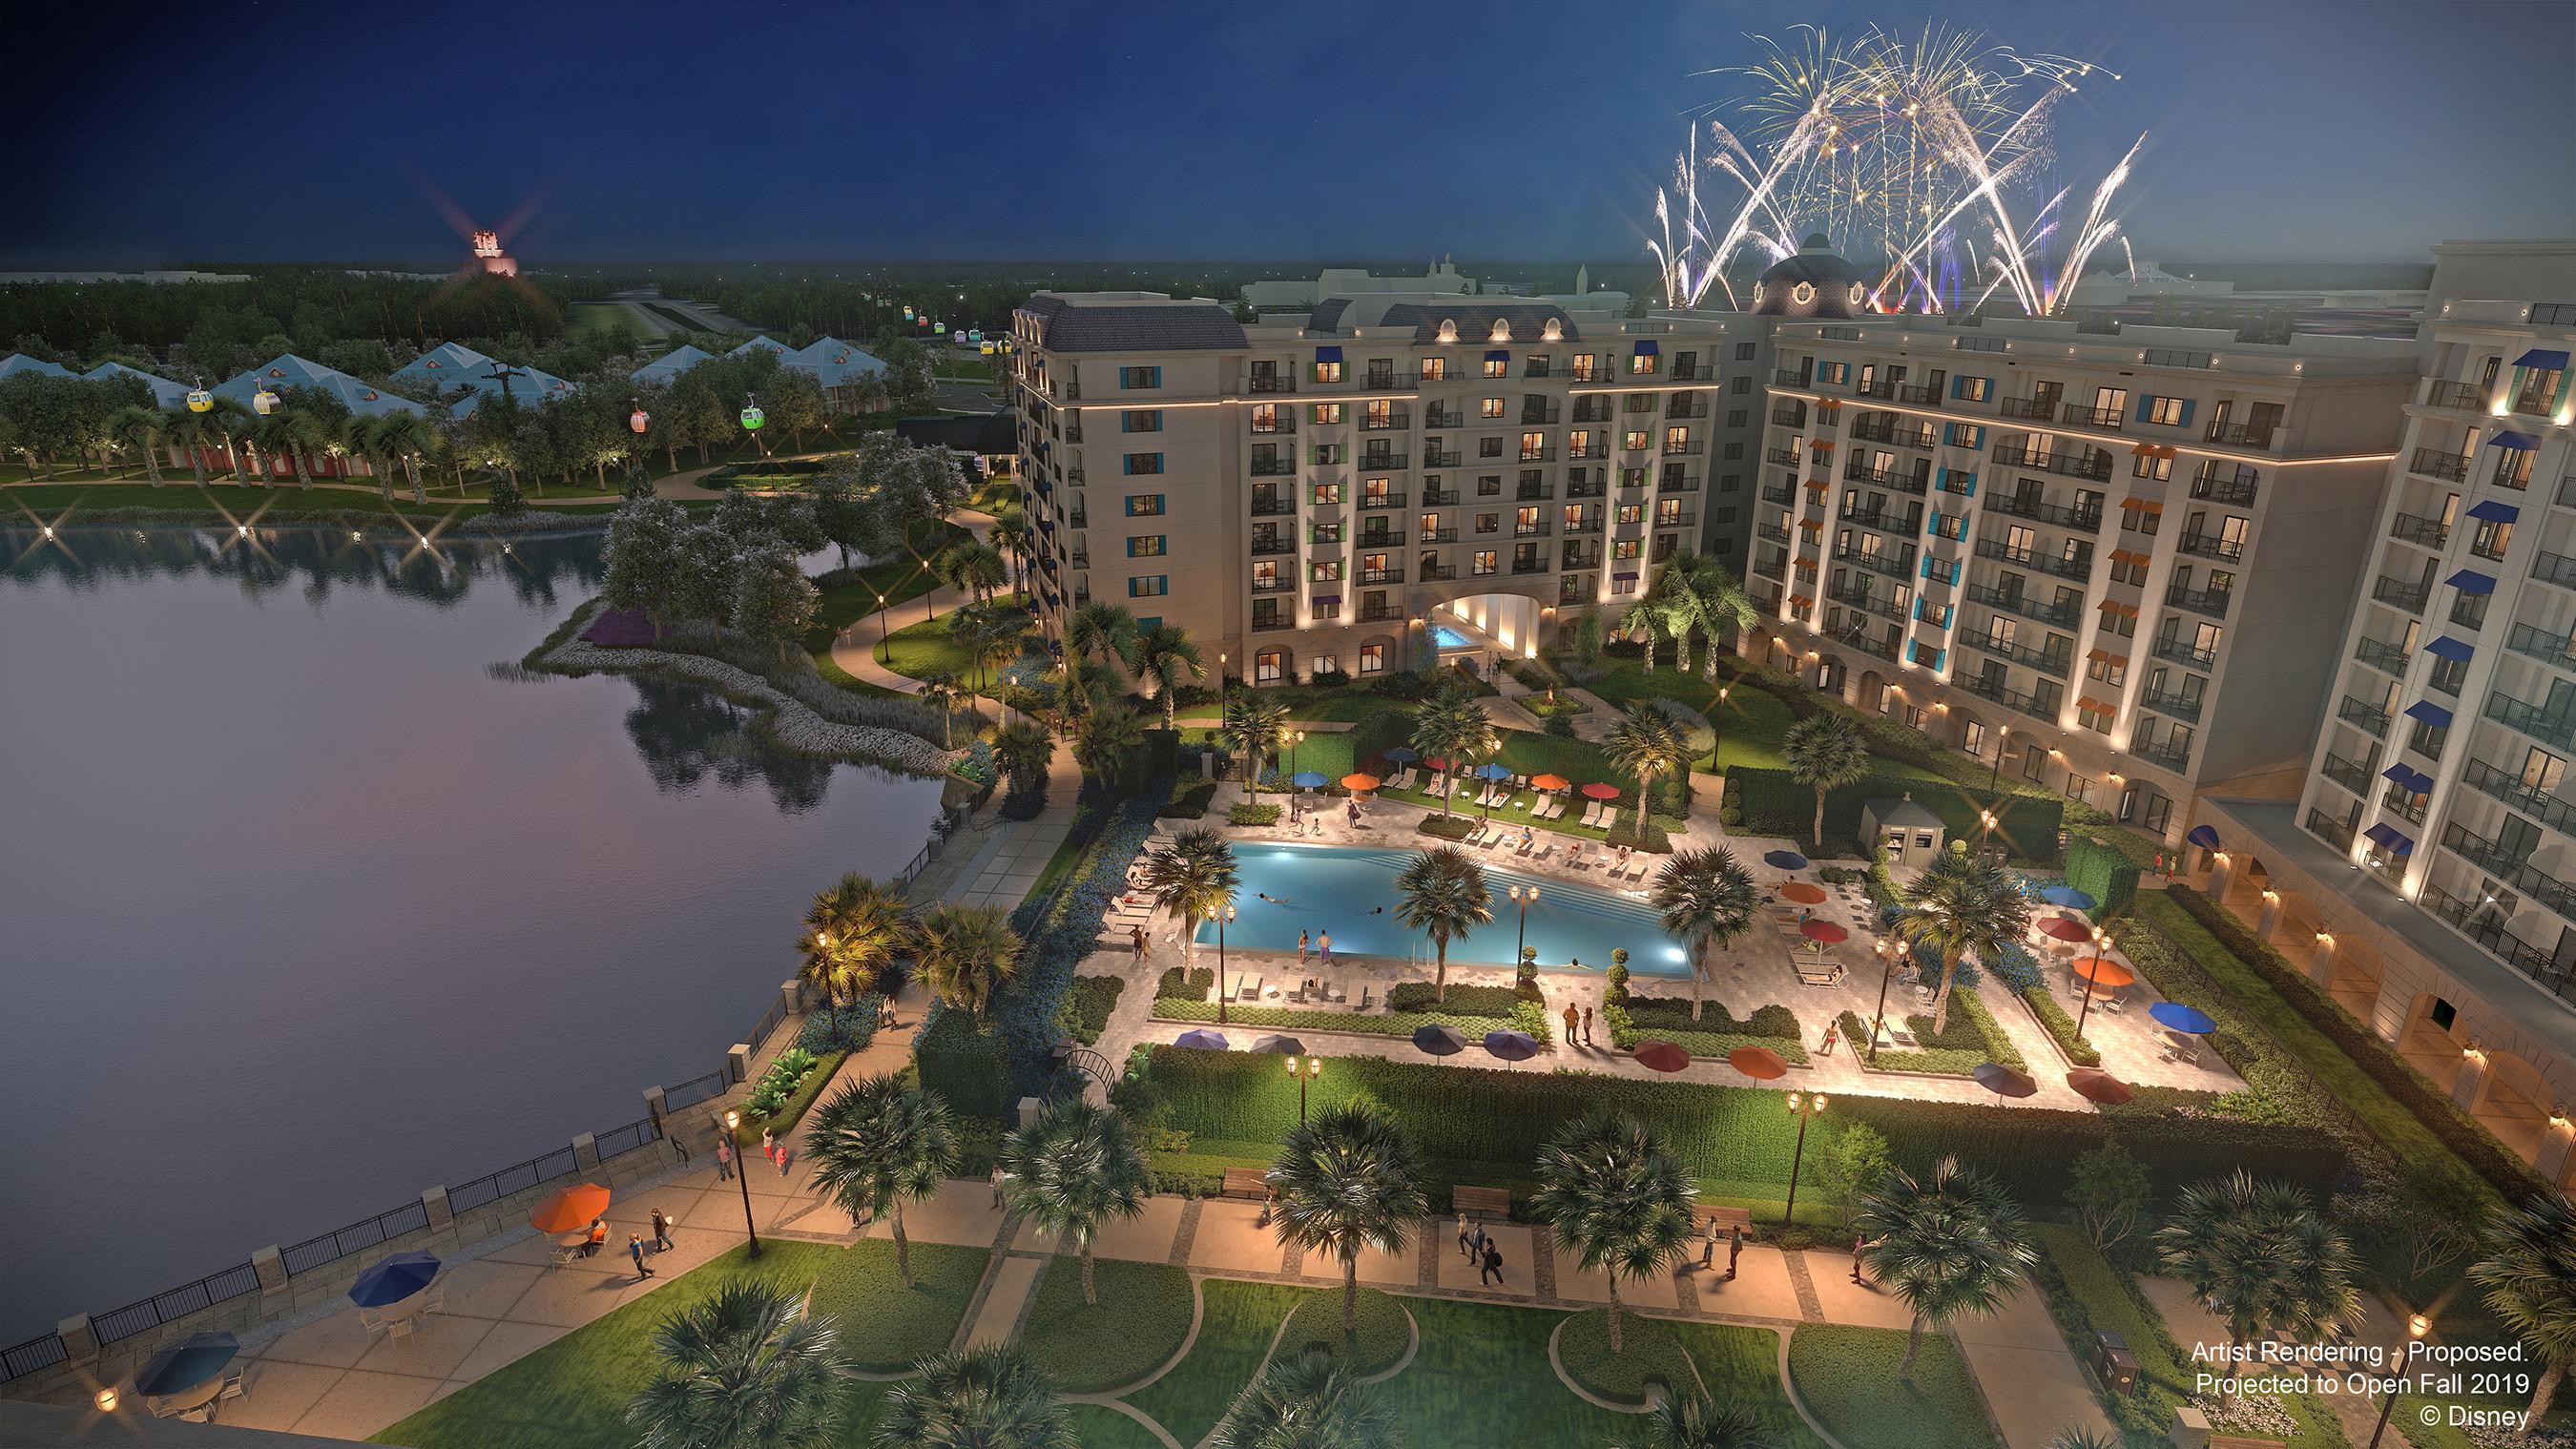 Disney's Rivieria Resort